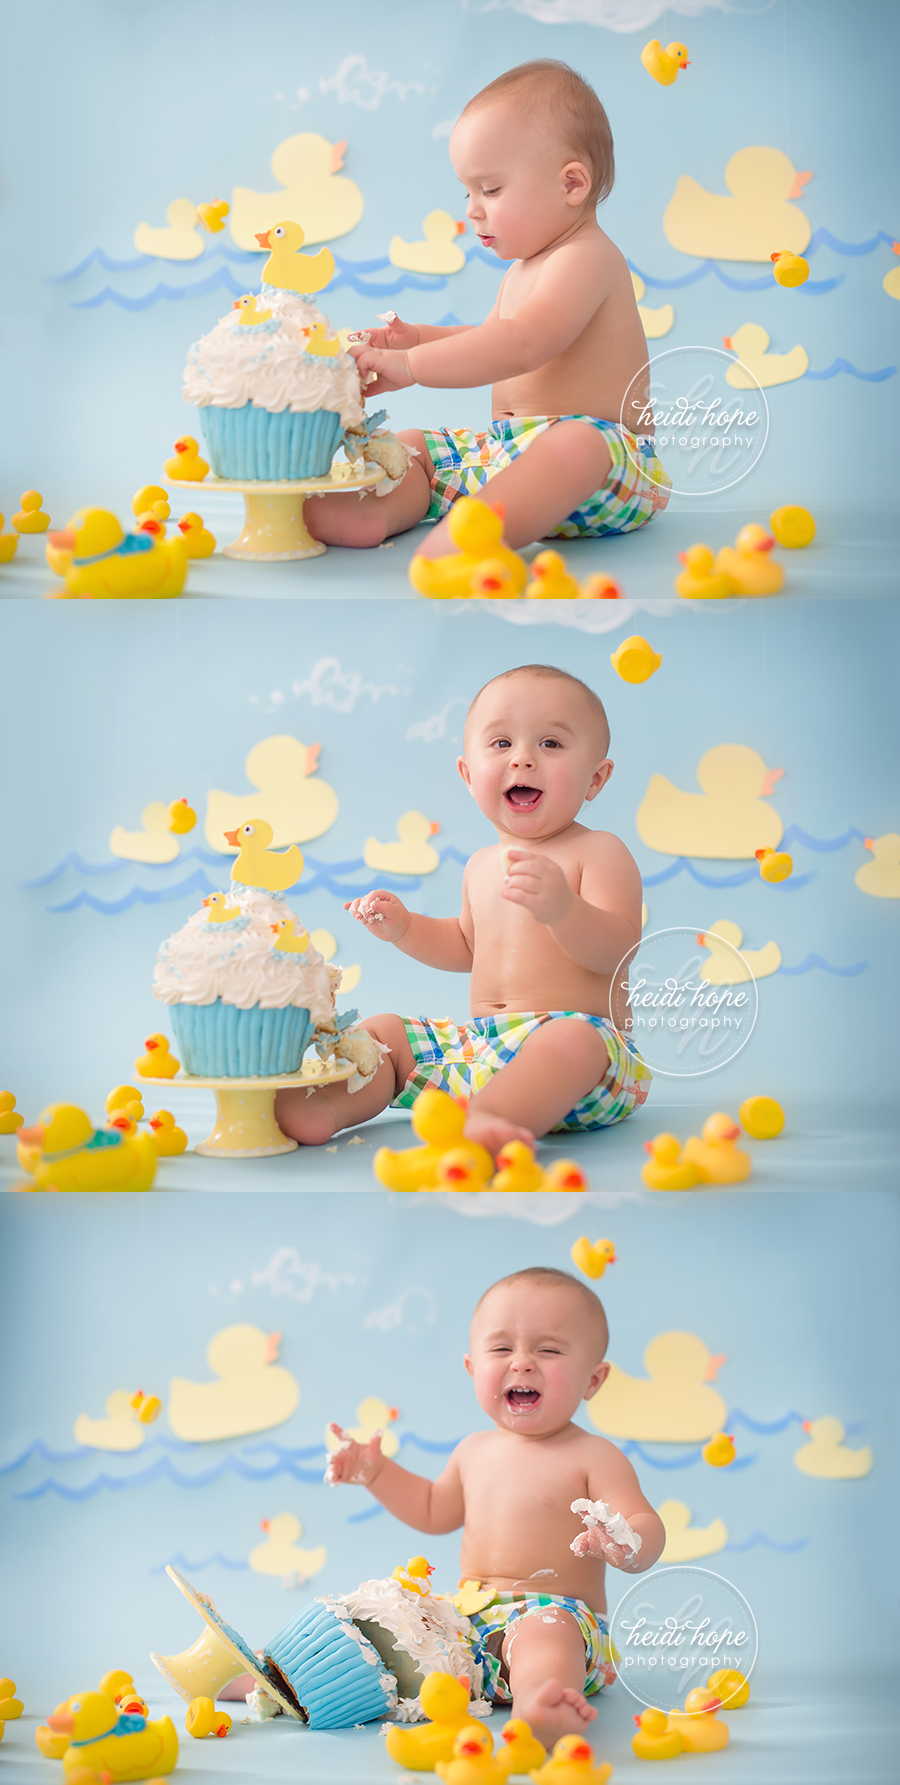 Sensational Rubber Ducky Cakesmash Rubberducky Cakesmash Firstbirthday Funny Birthday Cards Online Inifofree Goldxyz